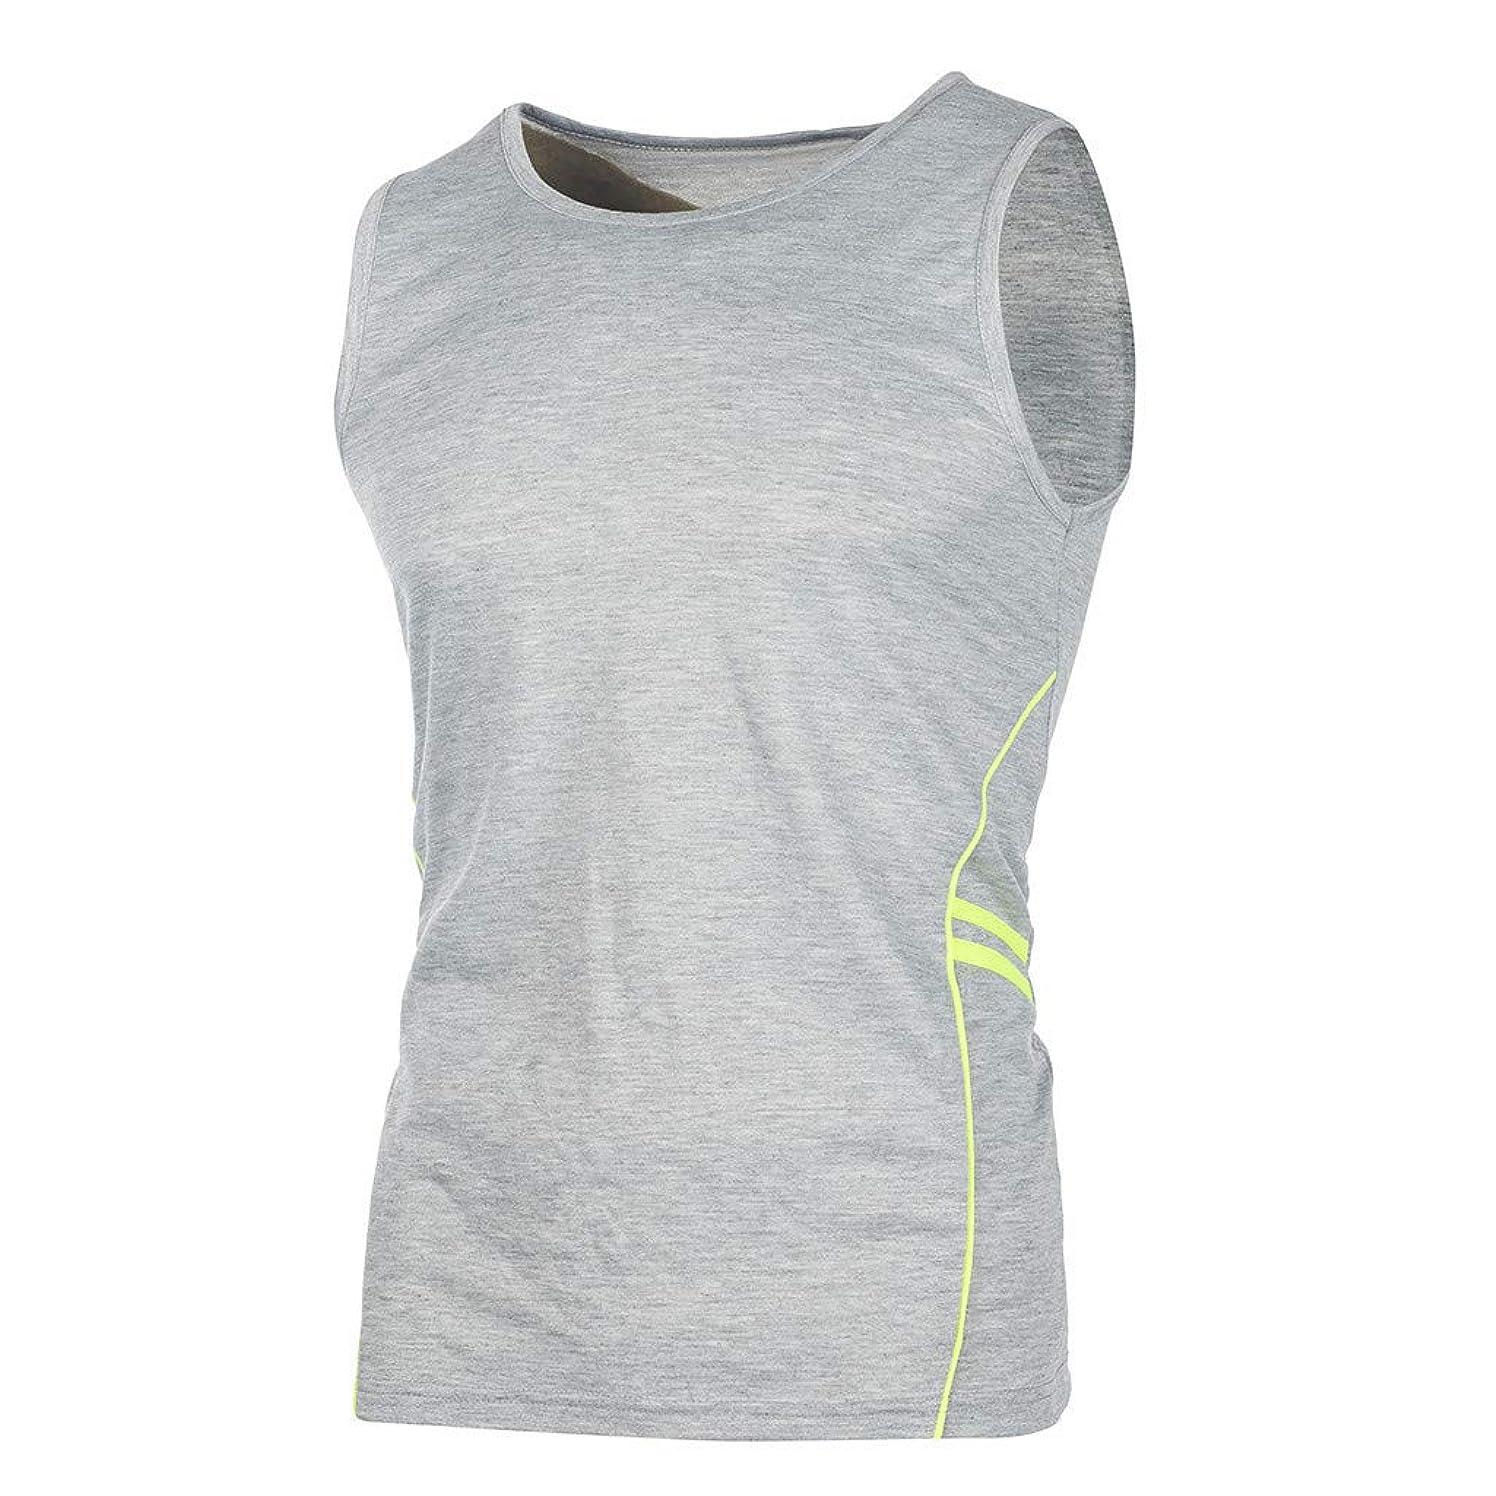 Yomiafy Men's Casual Slim Comfortable Sleeveless T-Shirt Tank Top Sport Fitness Vest